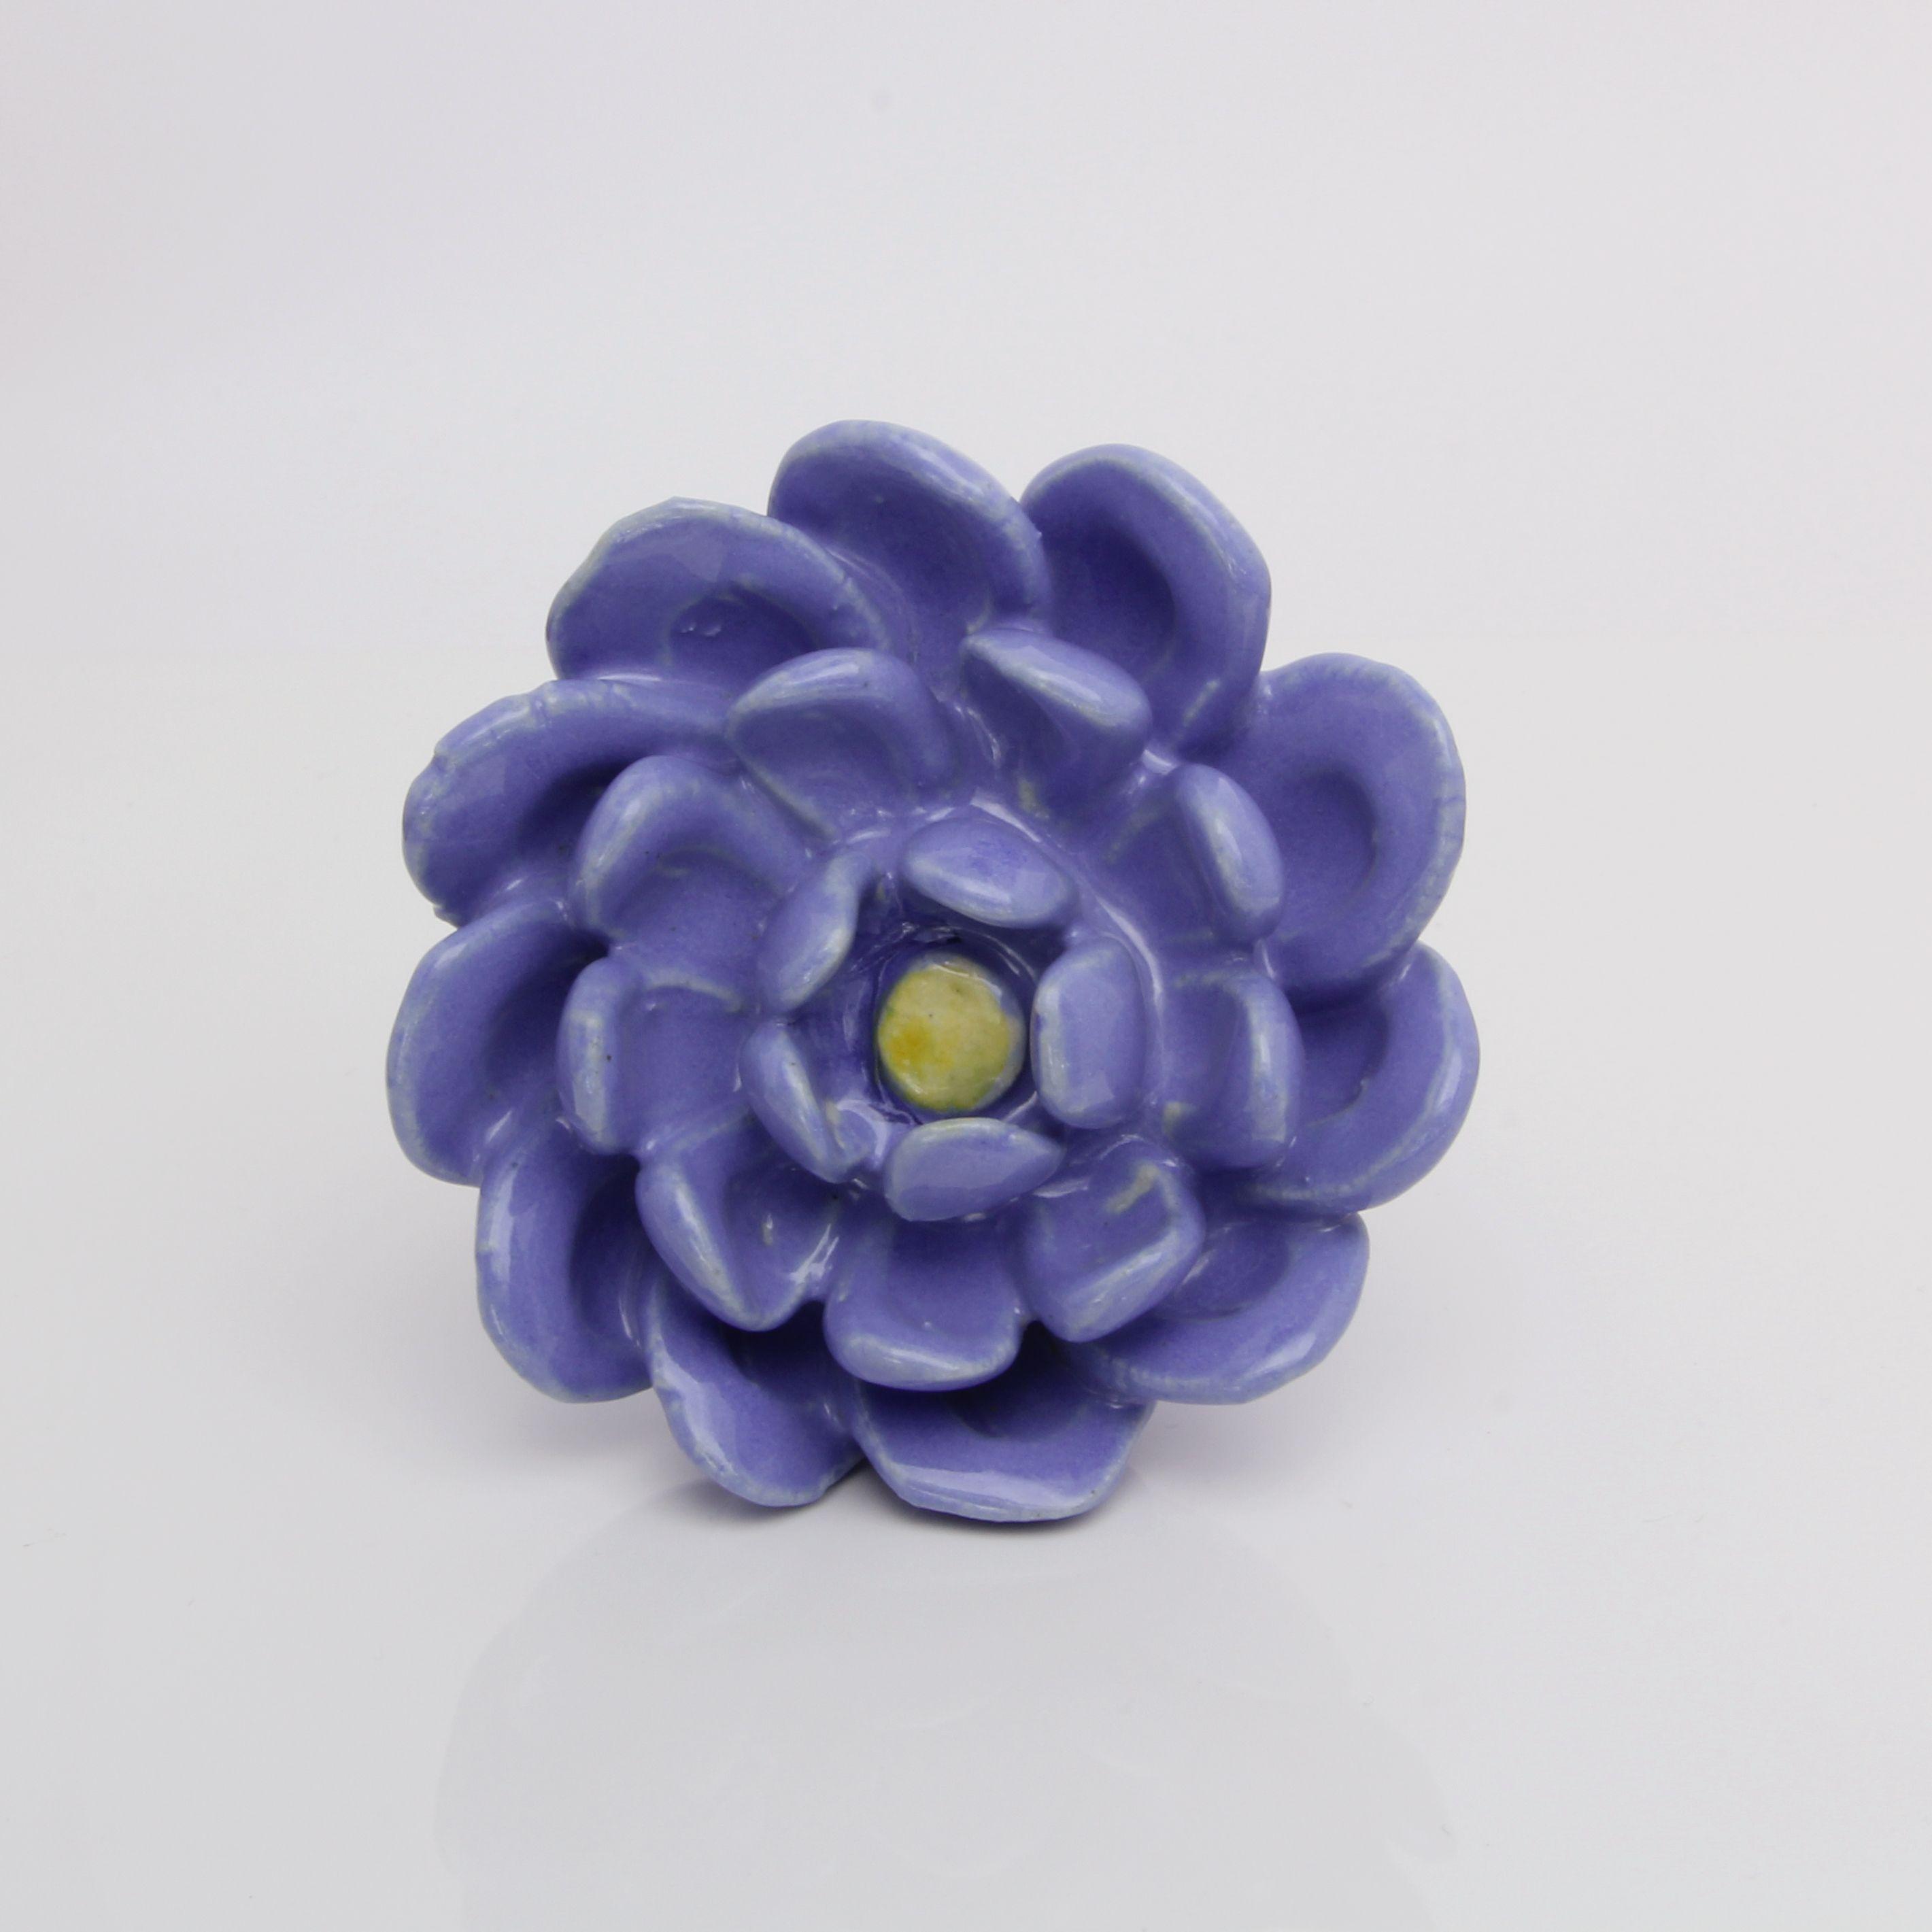 Blue Sky Flower Ceramic Door Knob, Large Floral Decorative Knob